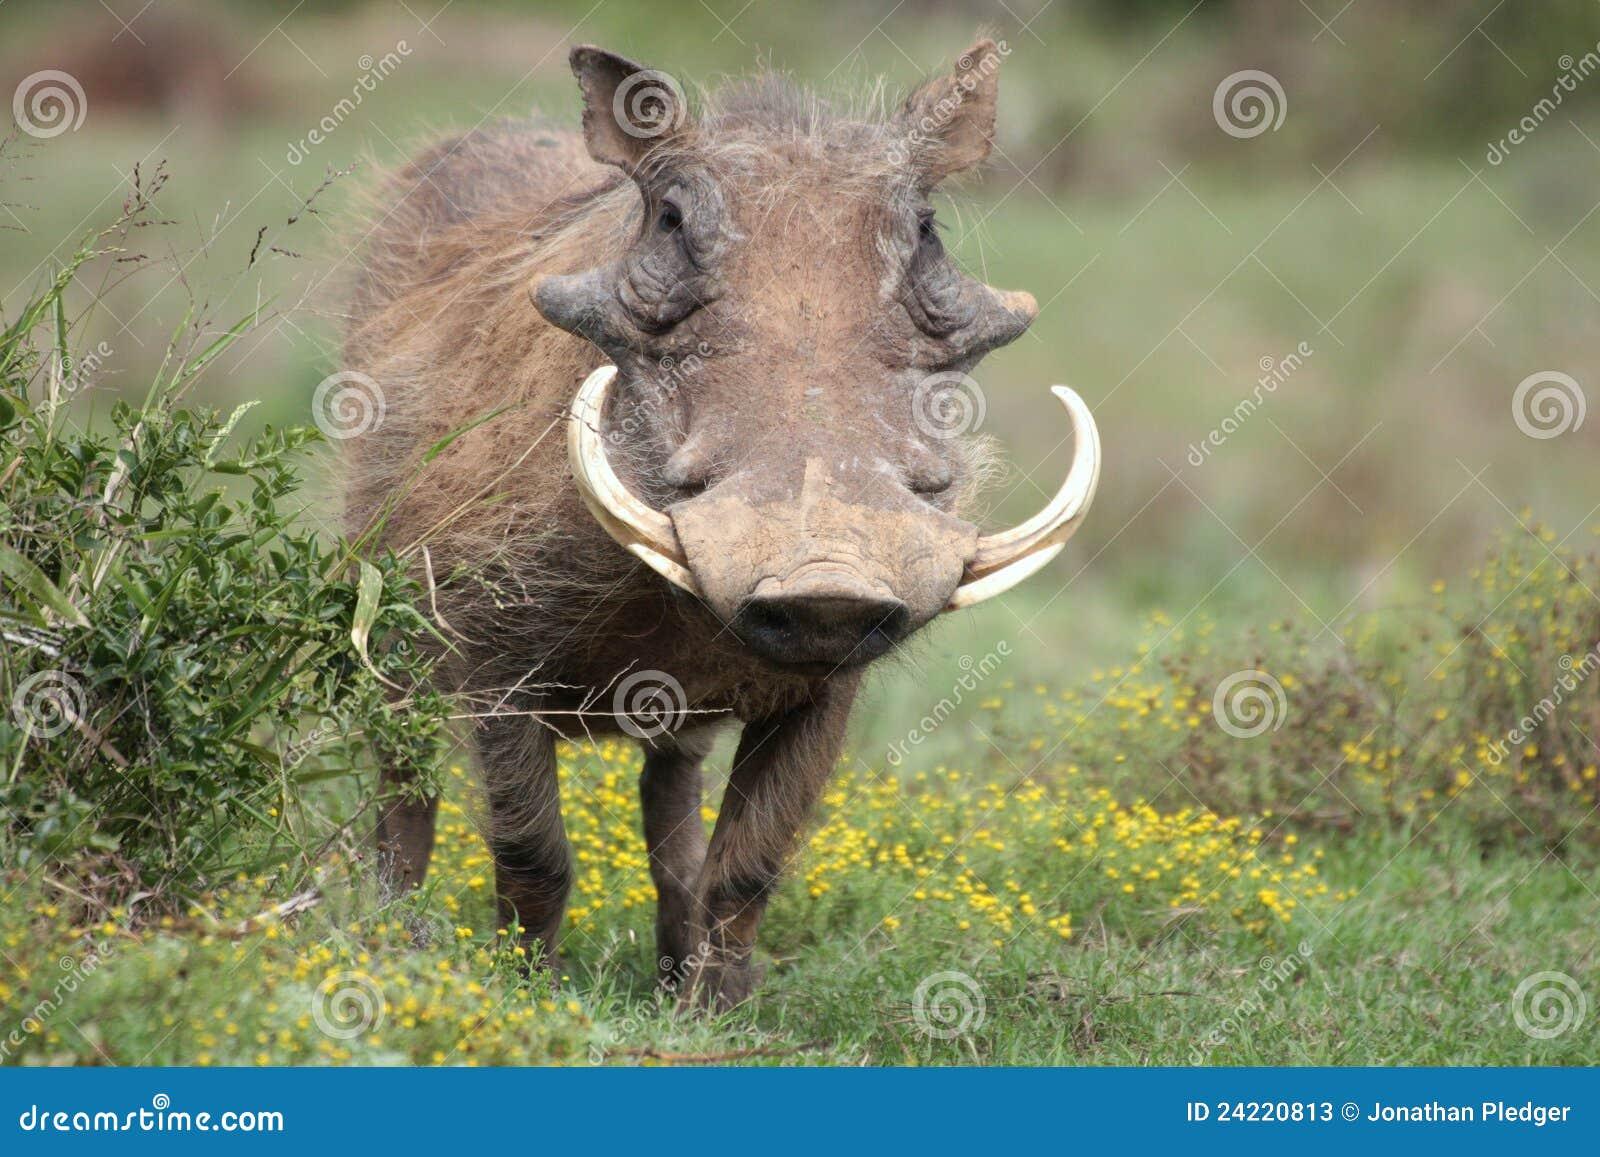 Un warthog avec de grandes défenses.